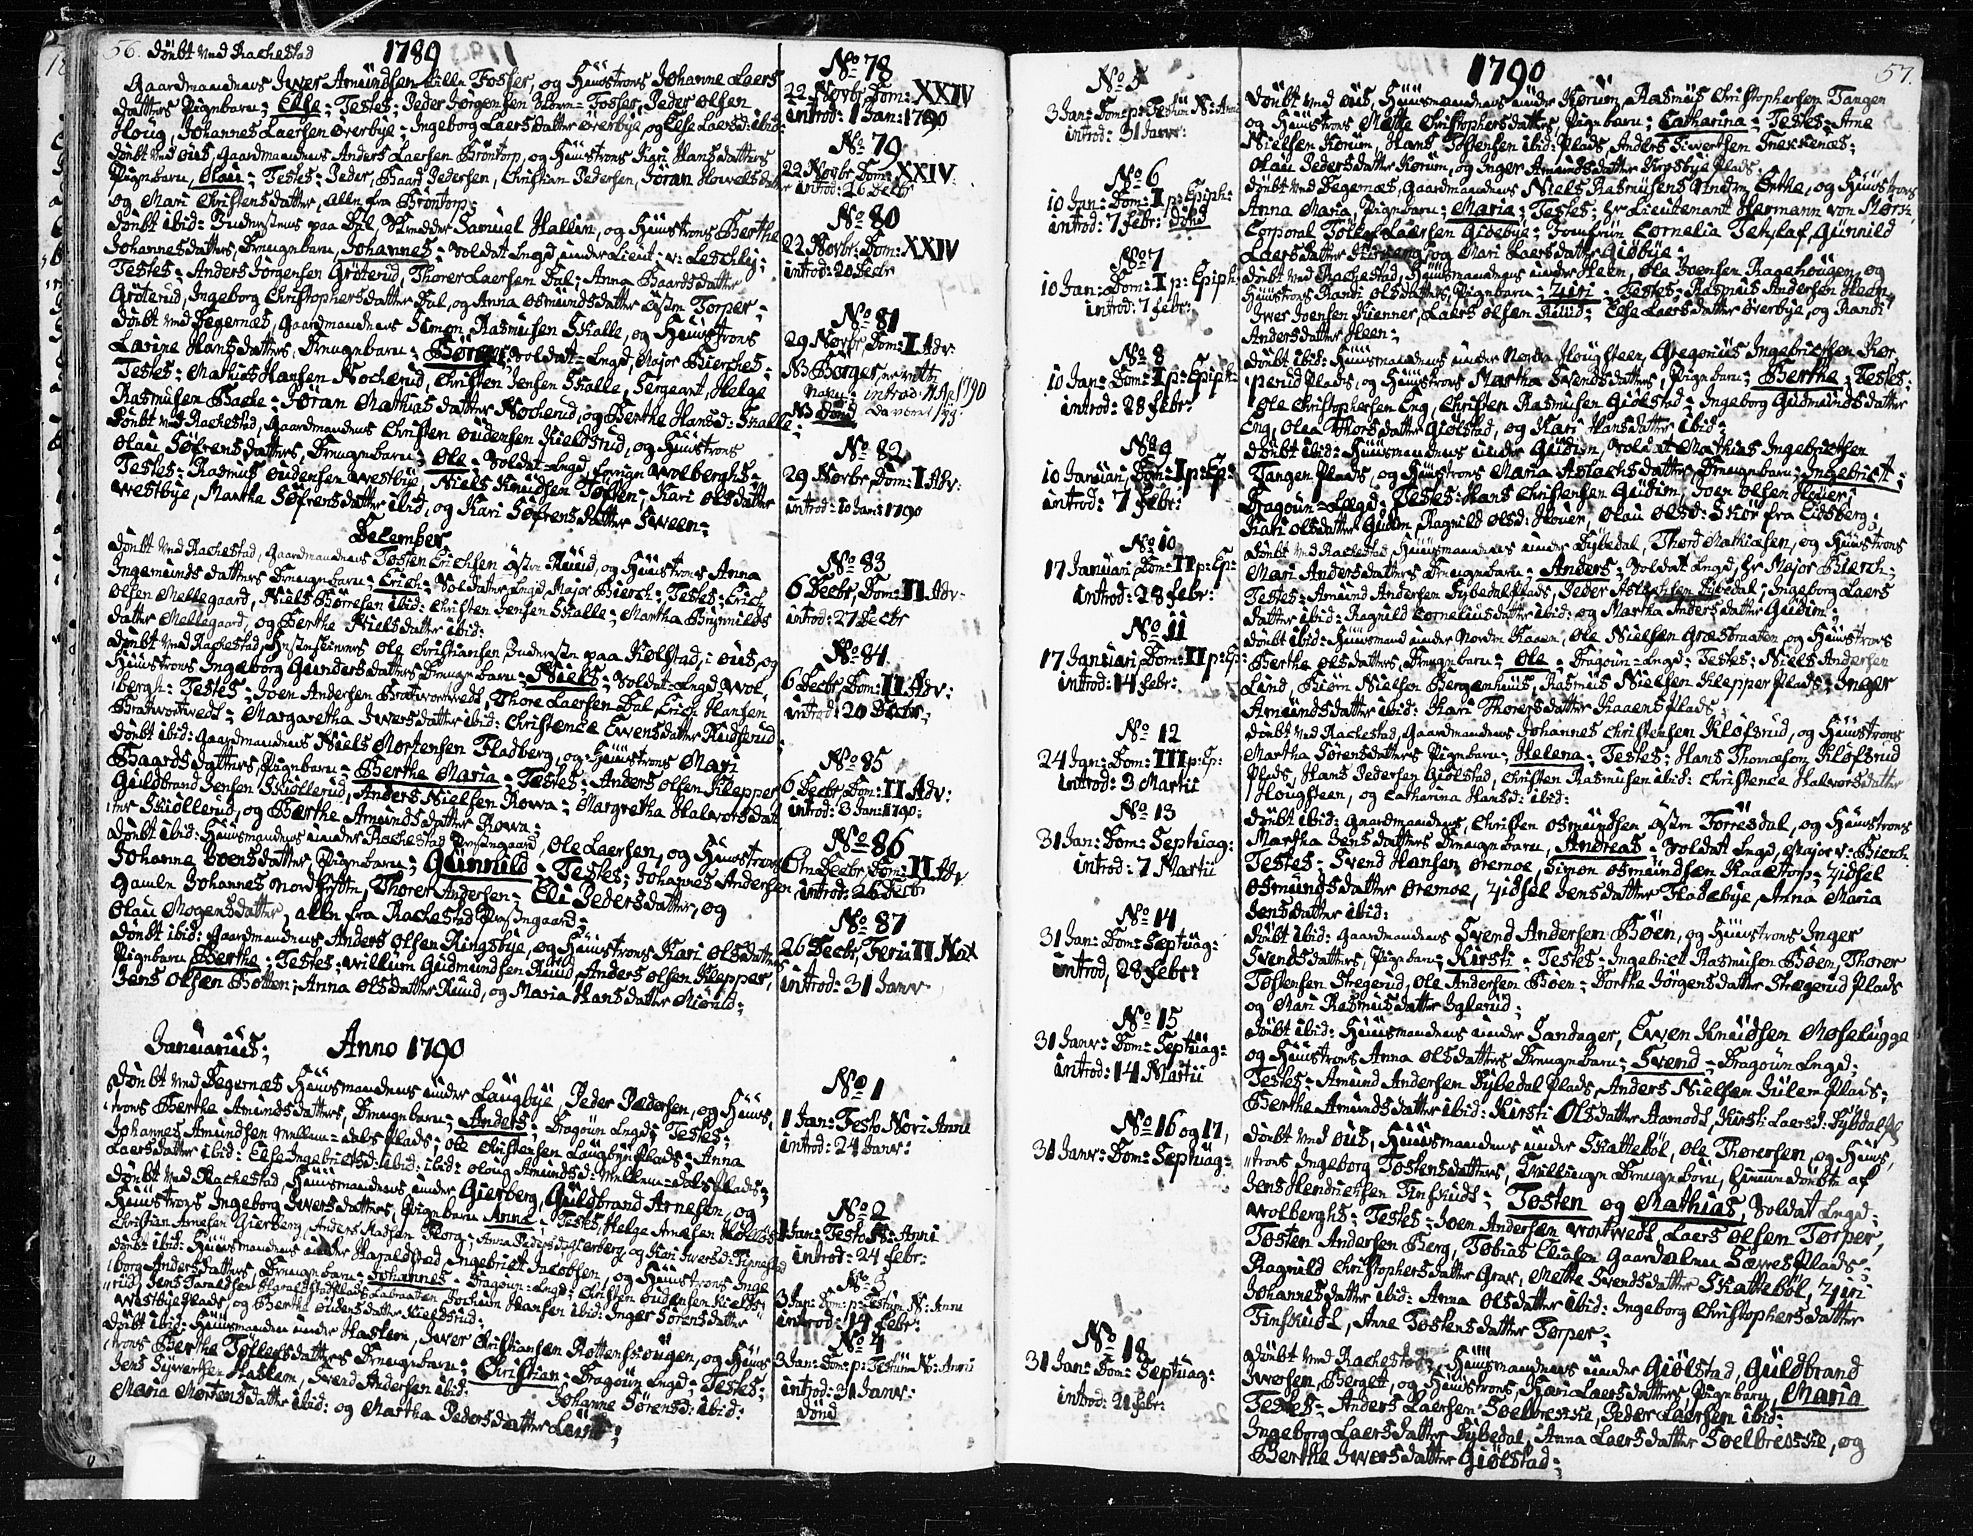 SAO, Rakkestad prestekontor Kirkebøker, F/Fa/L0005: Ministerialbok nr. I 5, 1784-1814, s. 56-57